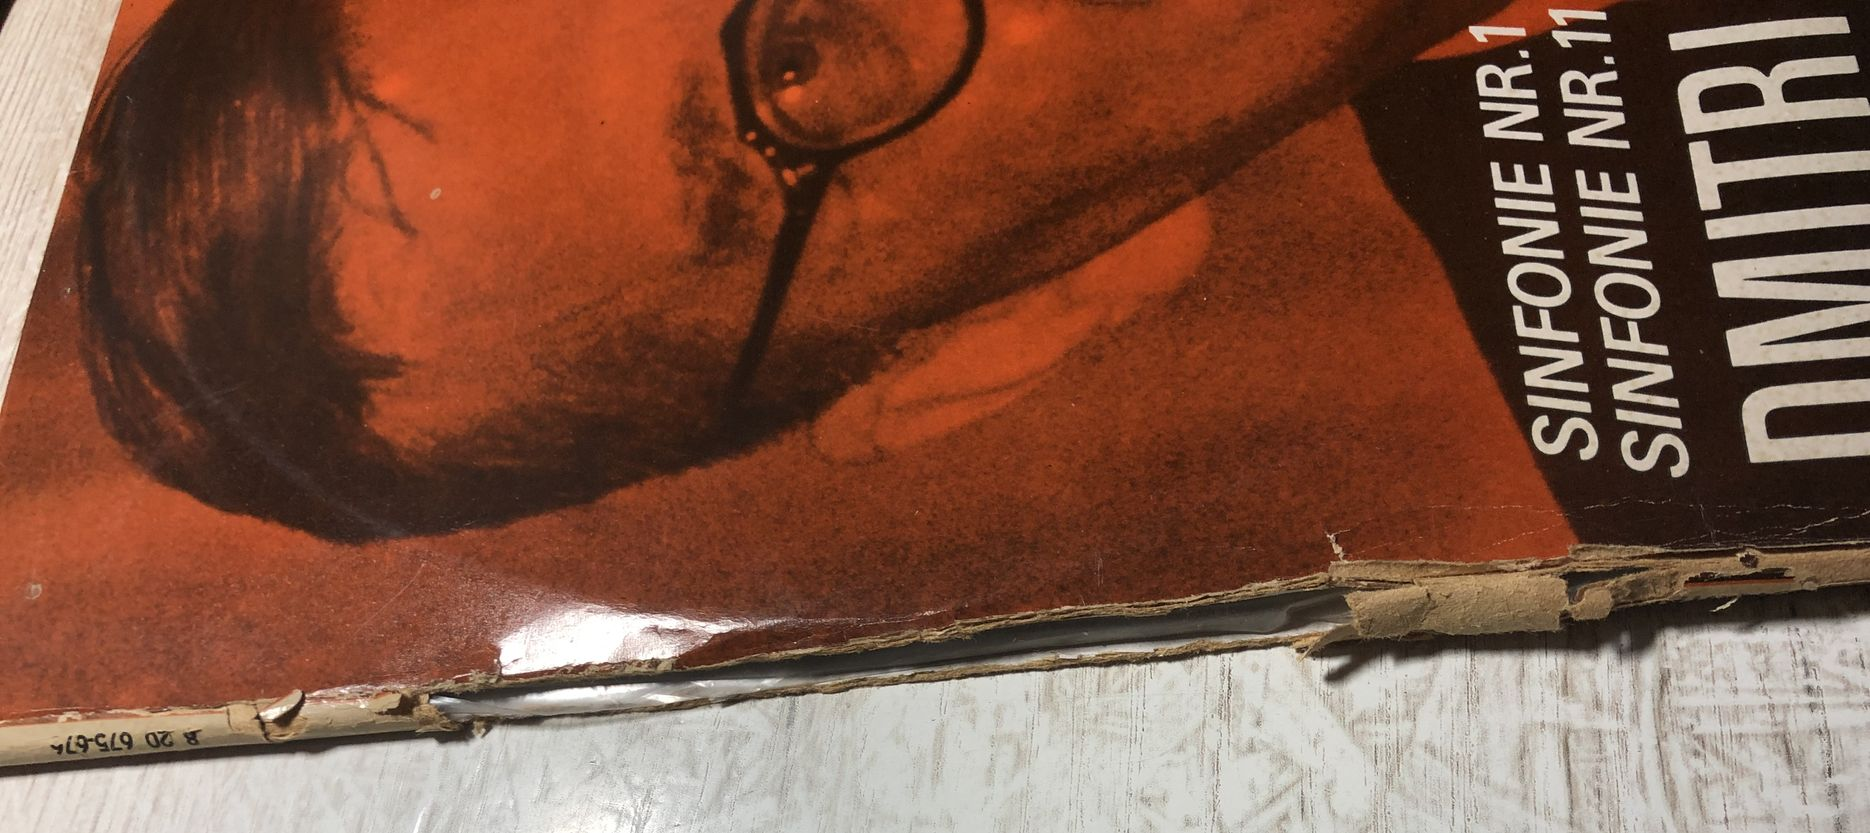 zerrissenes Cover einer Schallplatte